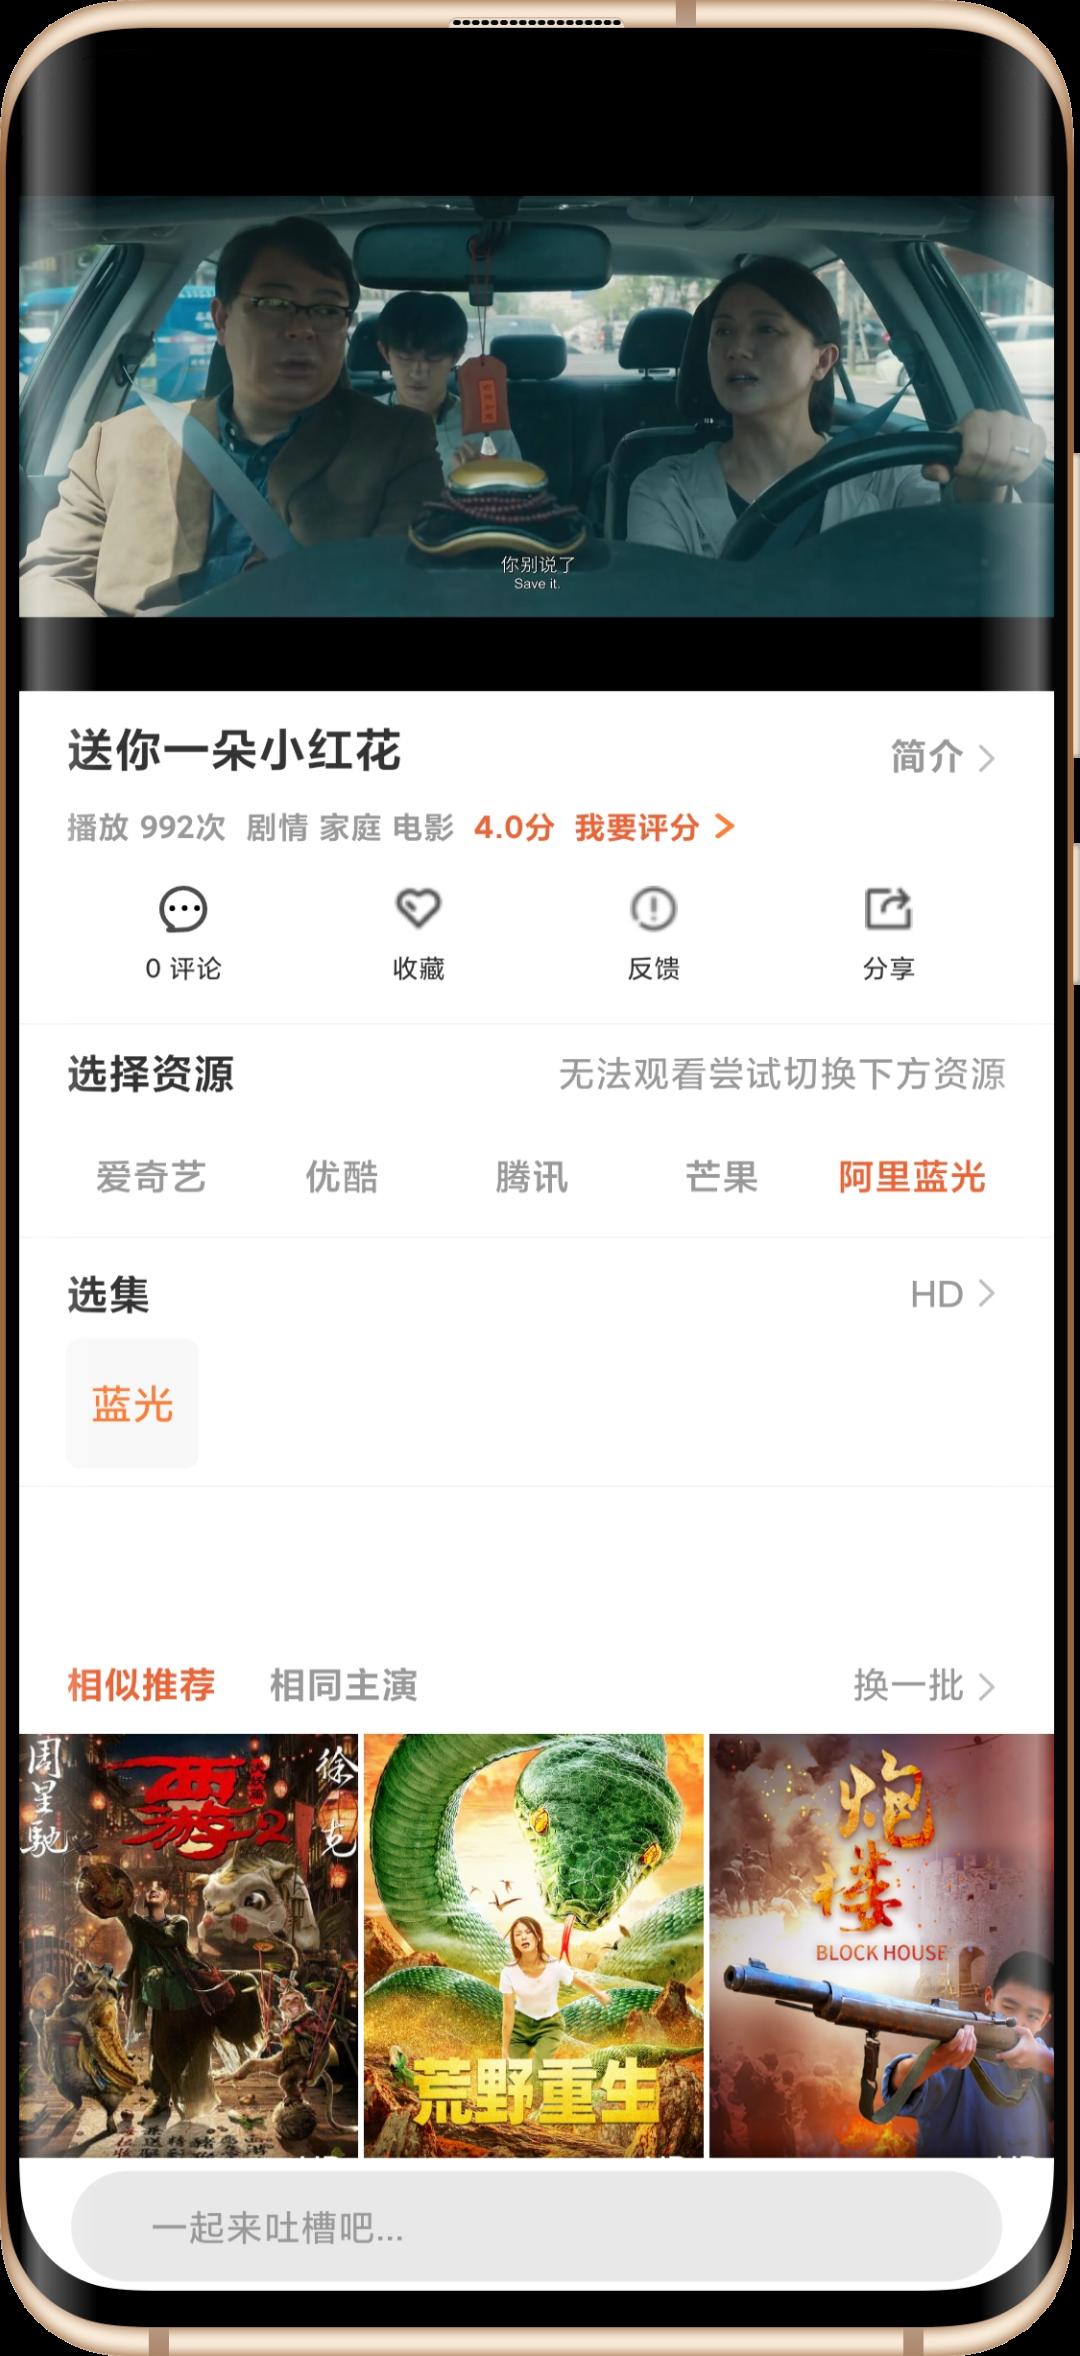 PiANKU 片库(安卓)一款资源丰富的影视网站,客户端免费下载